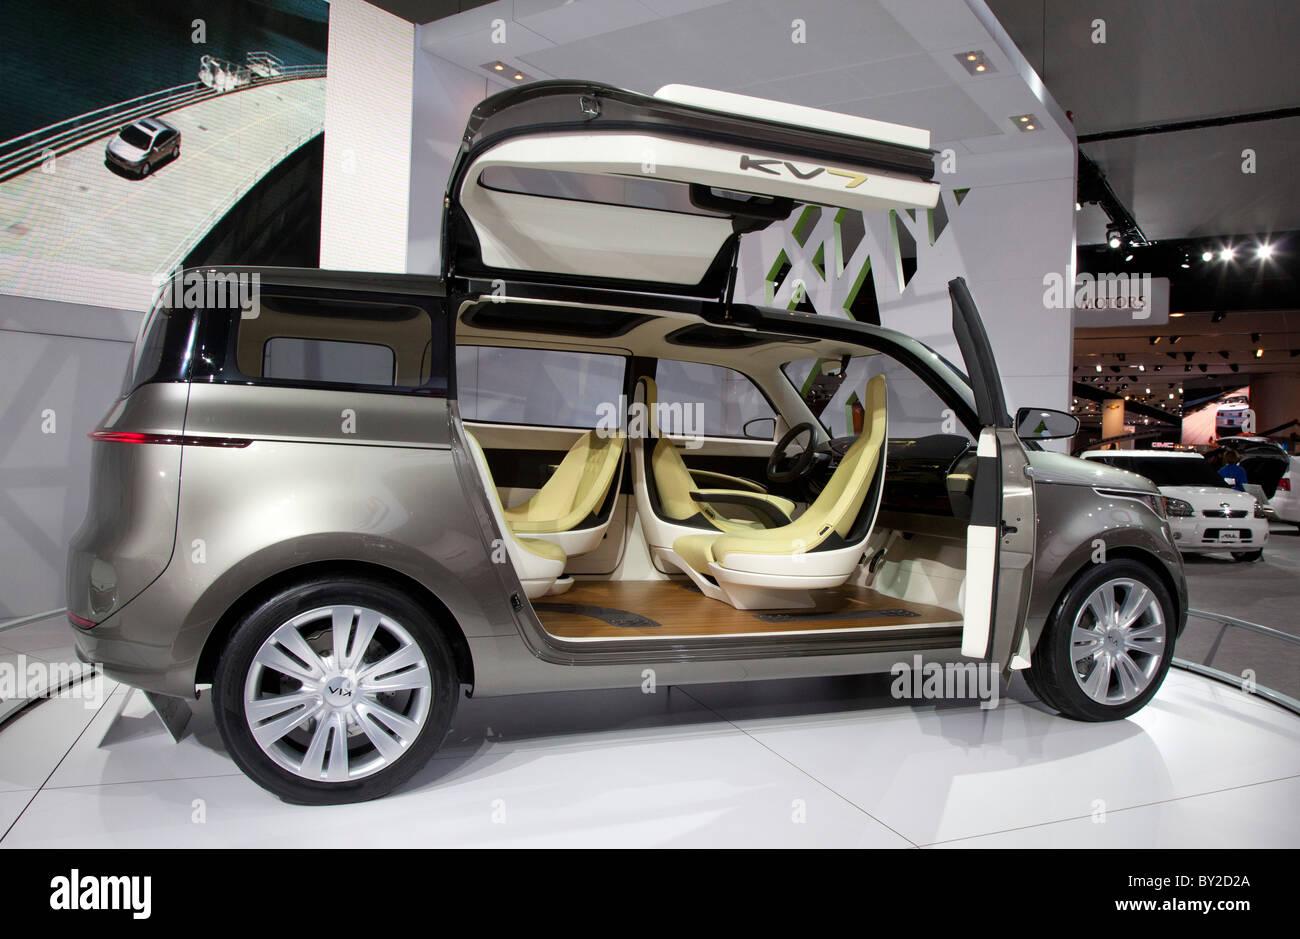 Detroit, Michigan - The Kia KV7 concept car on display at the North American International Auto Show. Stock Photo